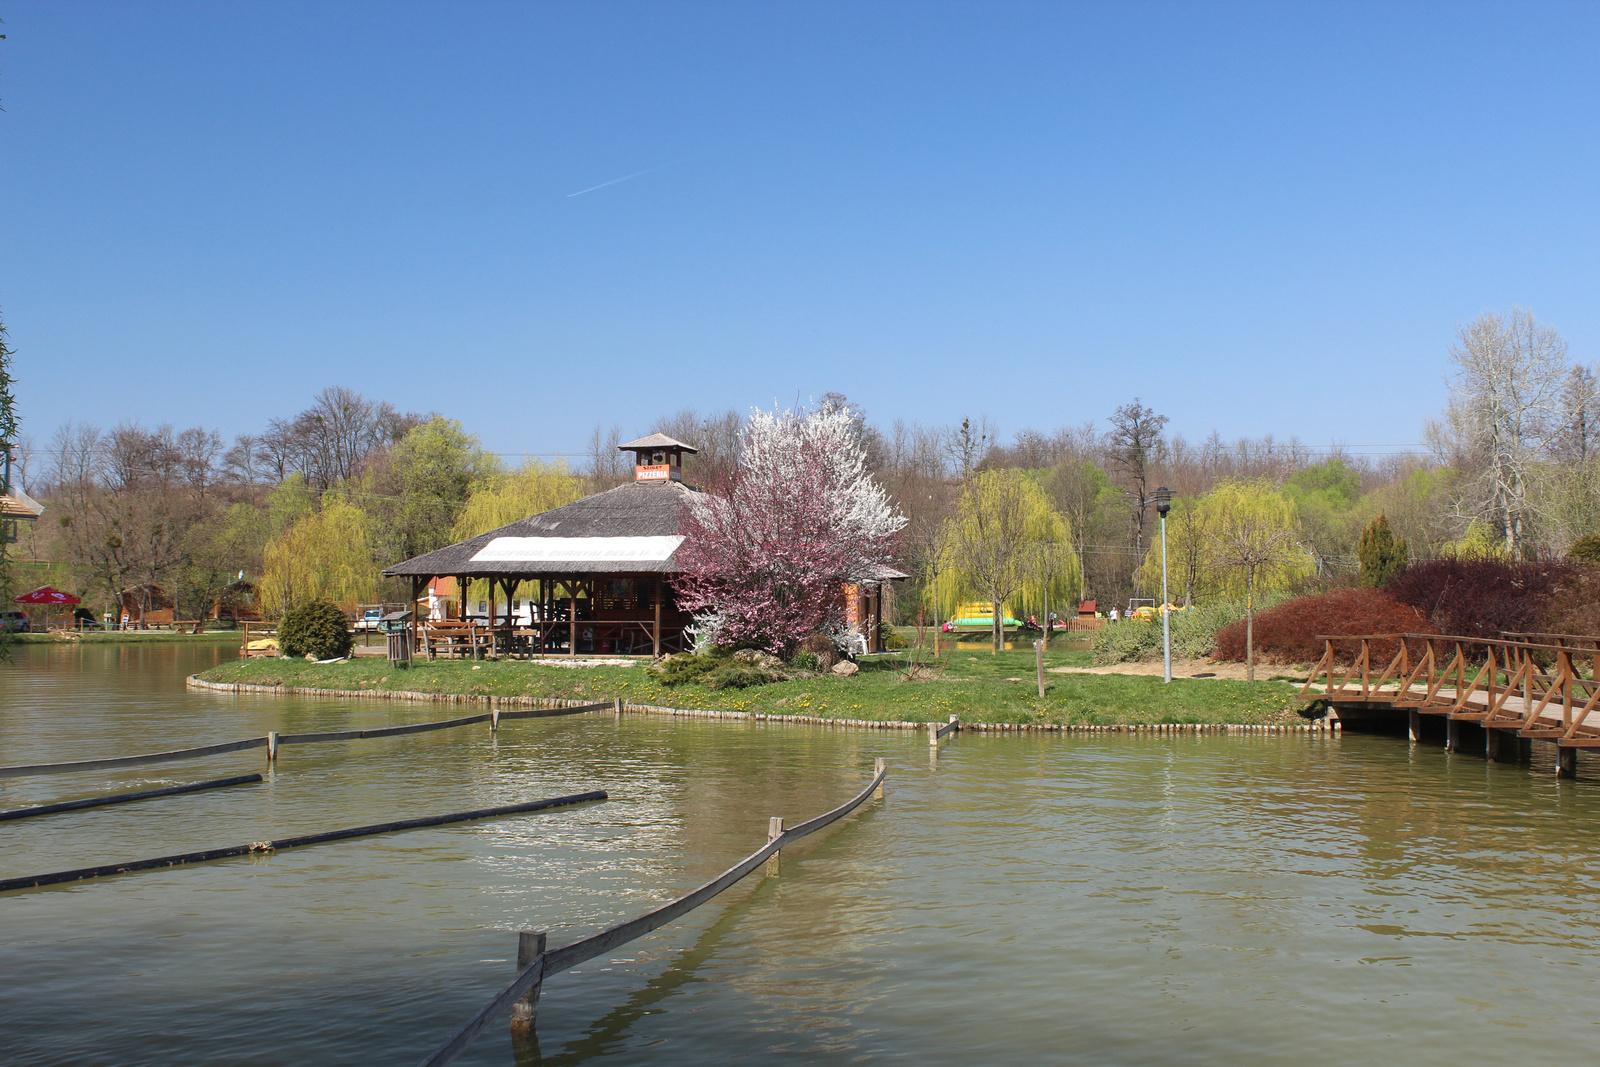 20170402-53-SobriJoskaKalandpark